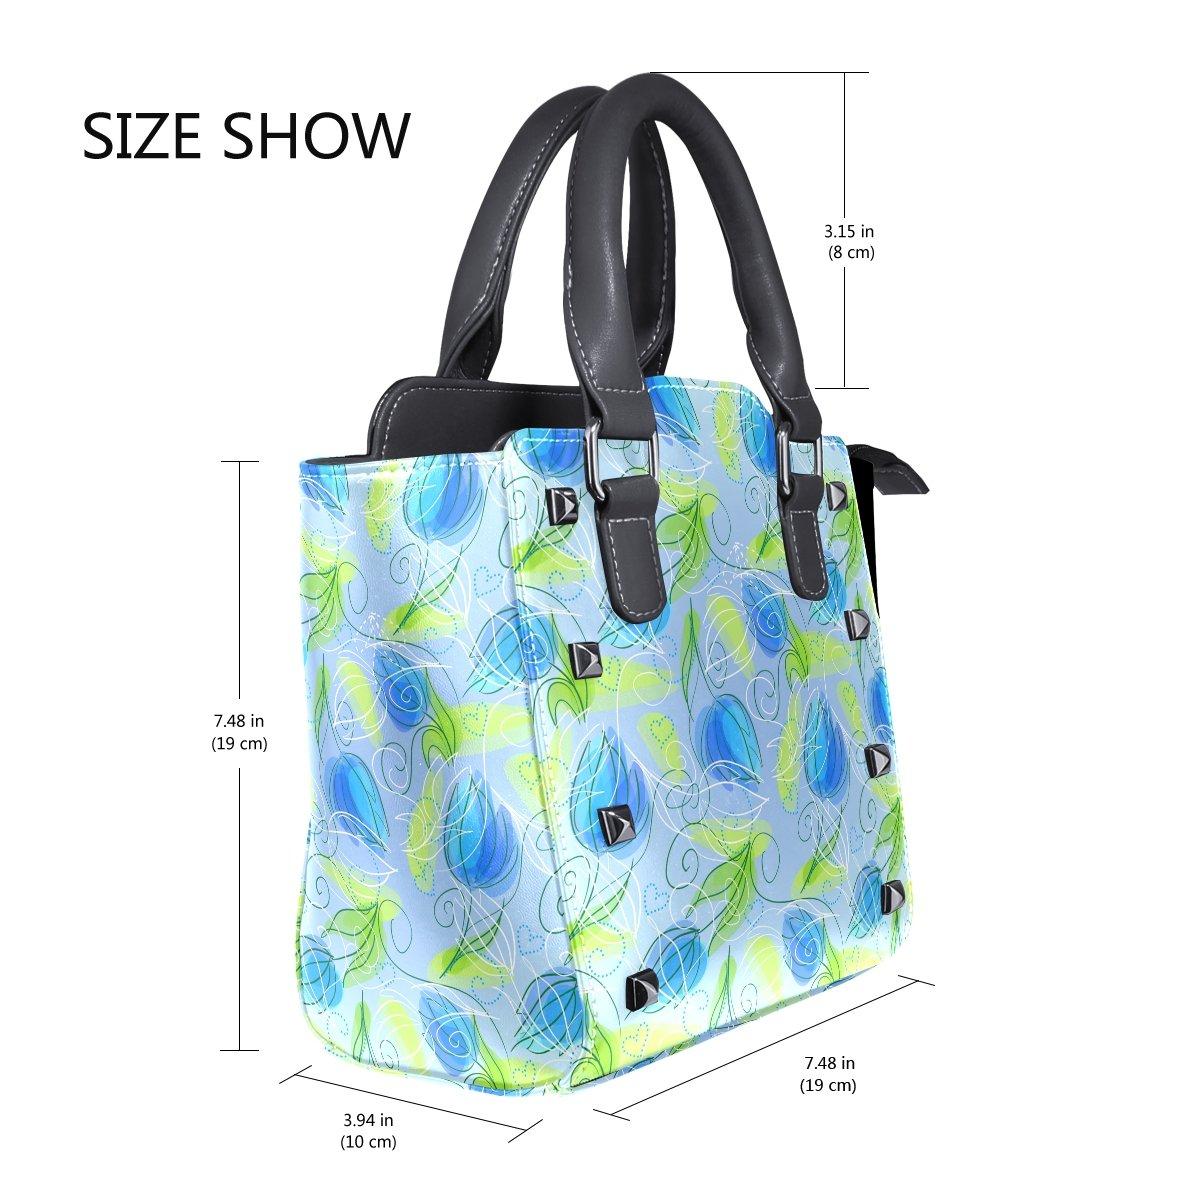 Jennifer PU Leather Top-Handle Handbags Abstract Blue Flower Patterns Single-Shoulder Tote Crossbody Bag Messenger Bags For Women